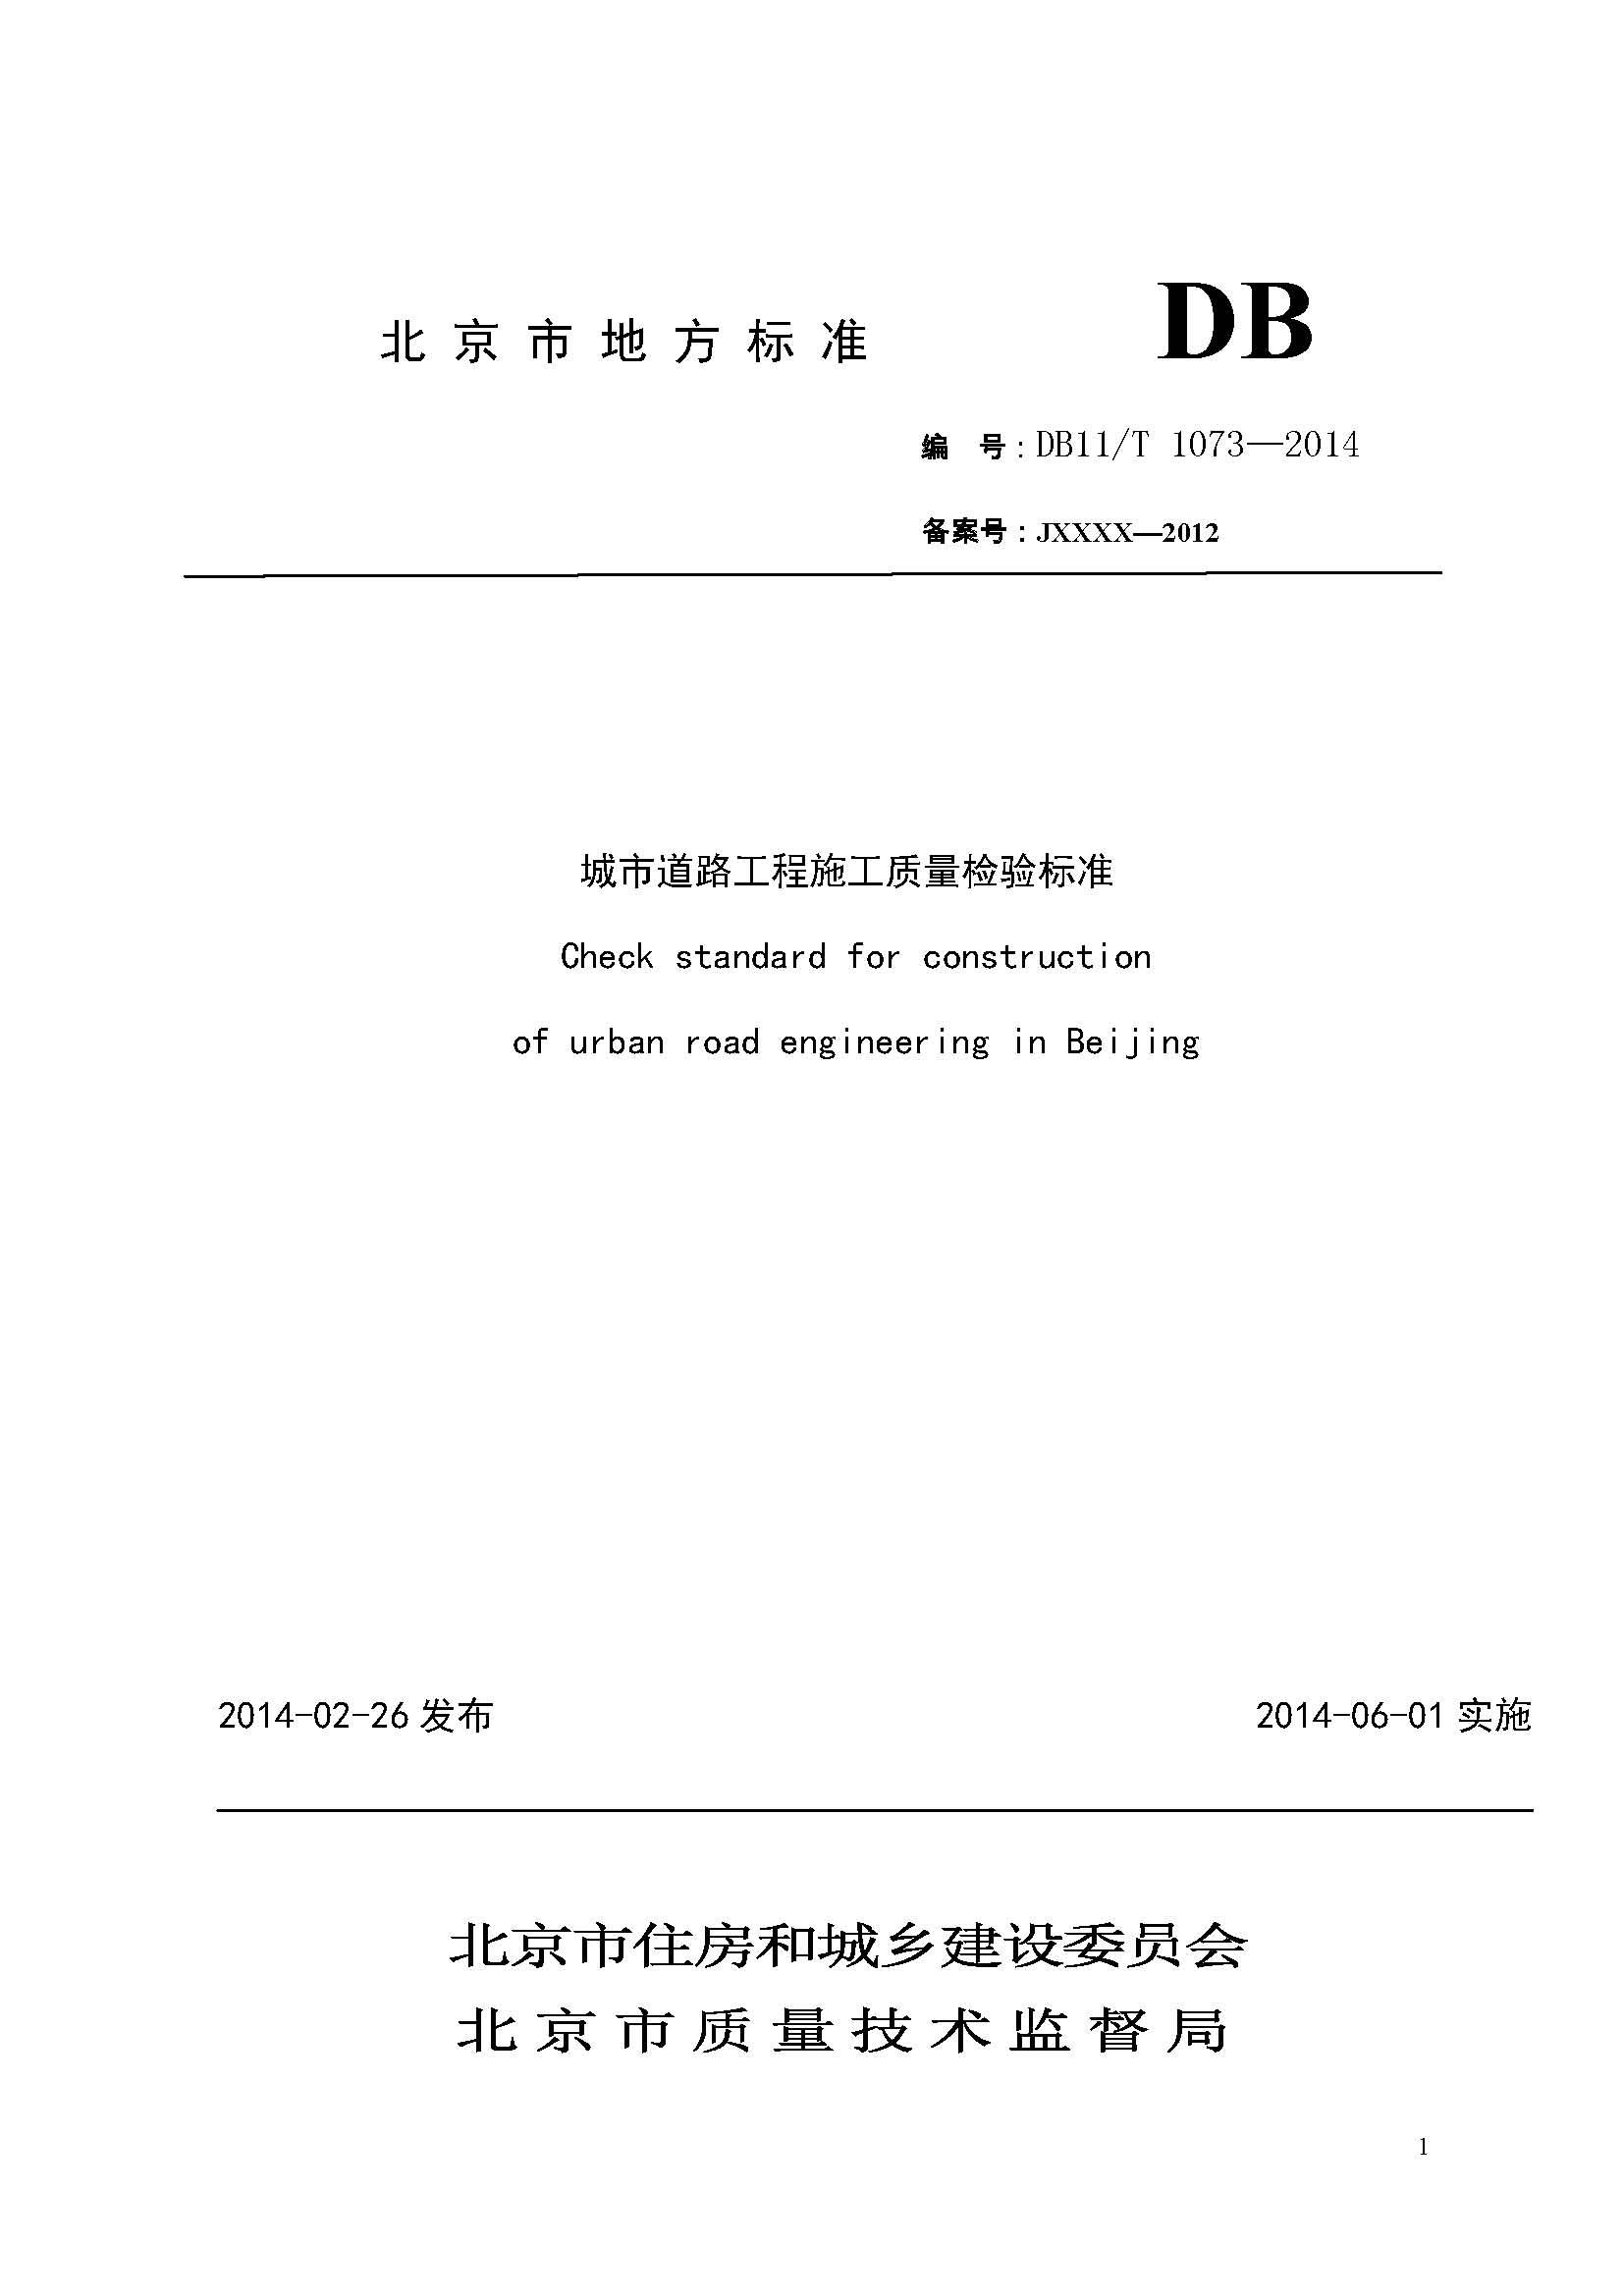 DB11/T 1073-2014城市道路工程施工质量检验标准